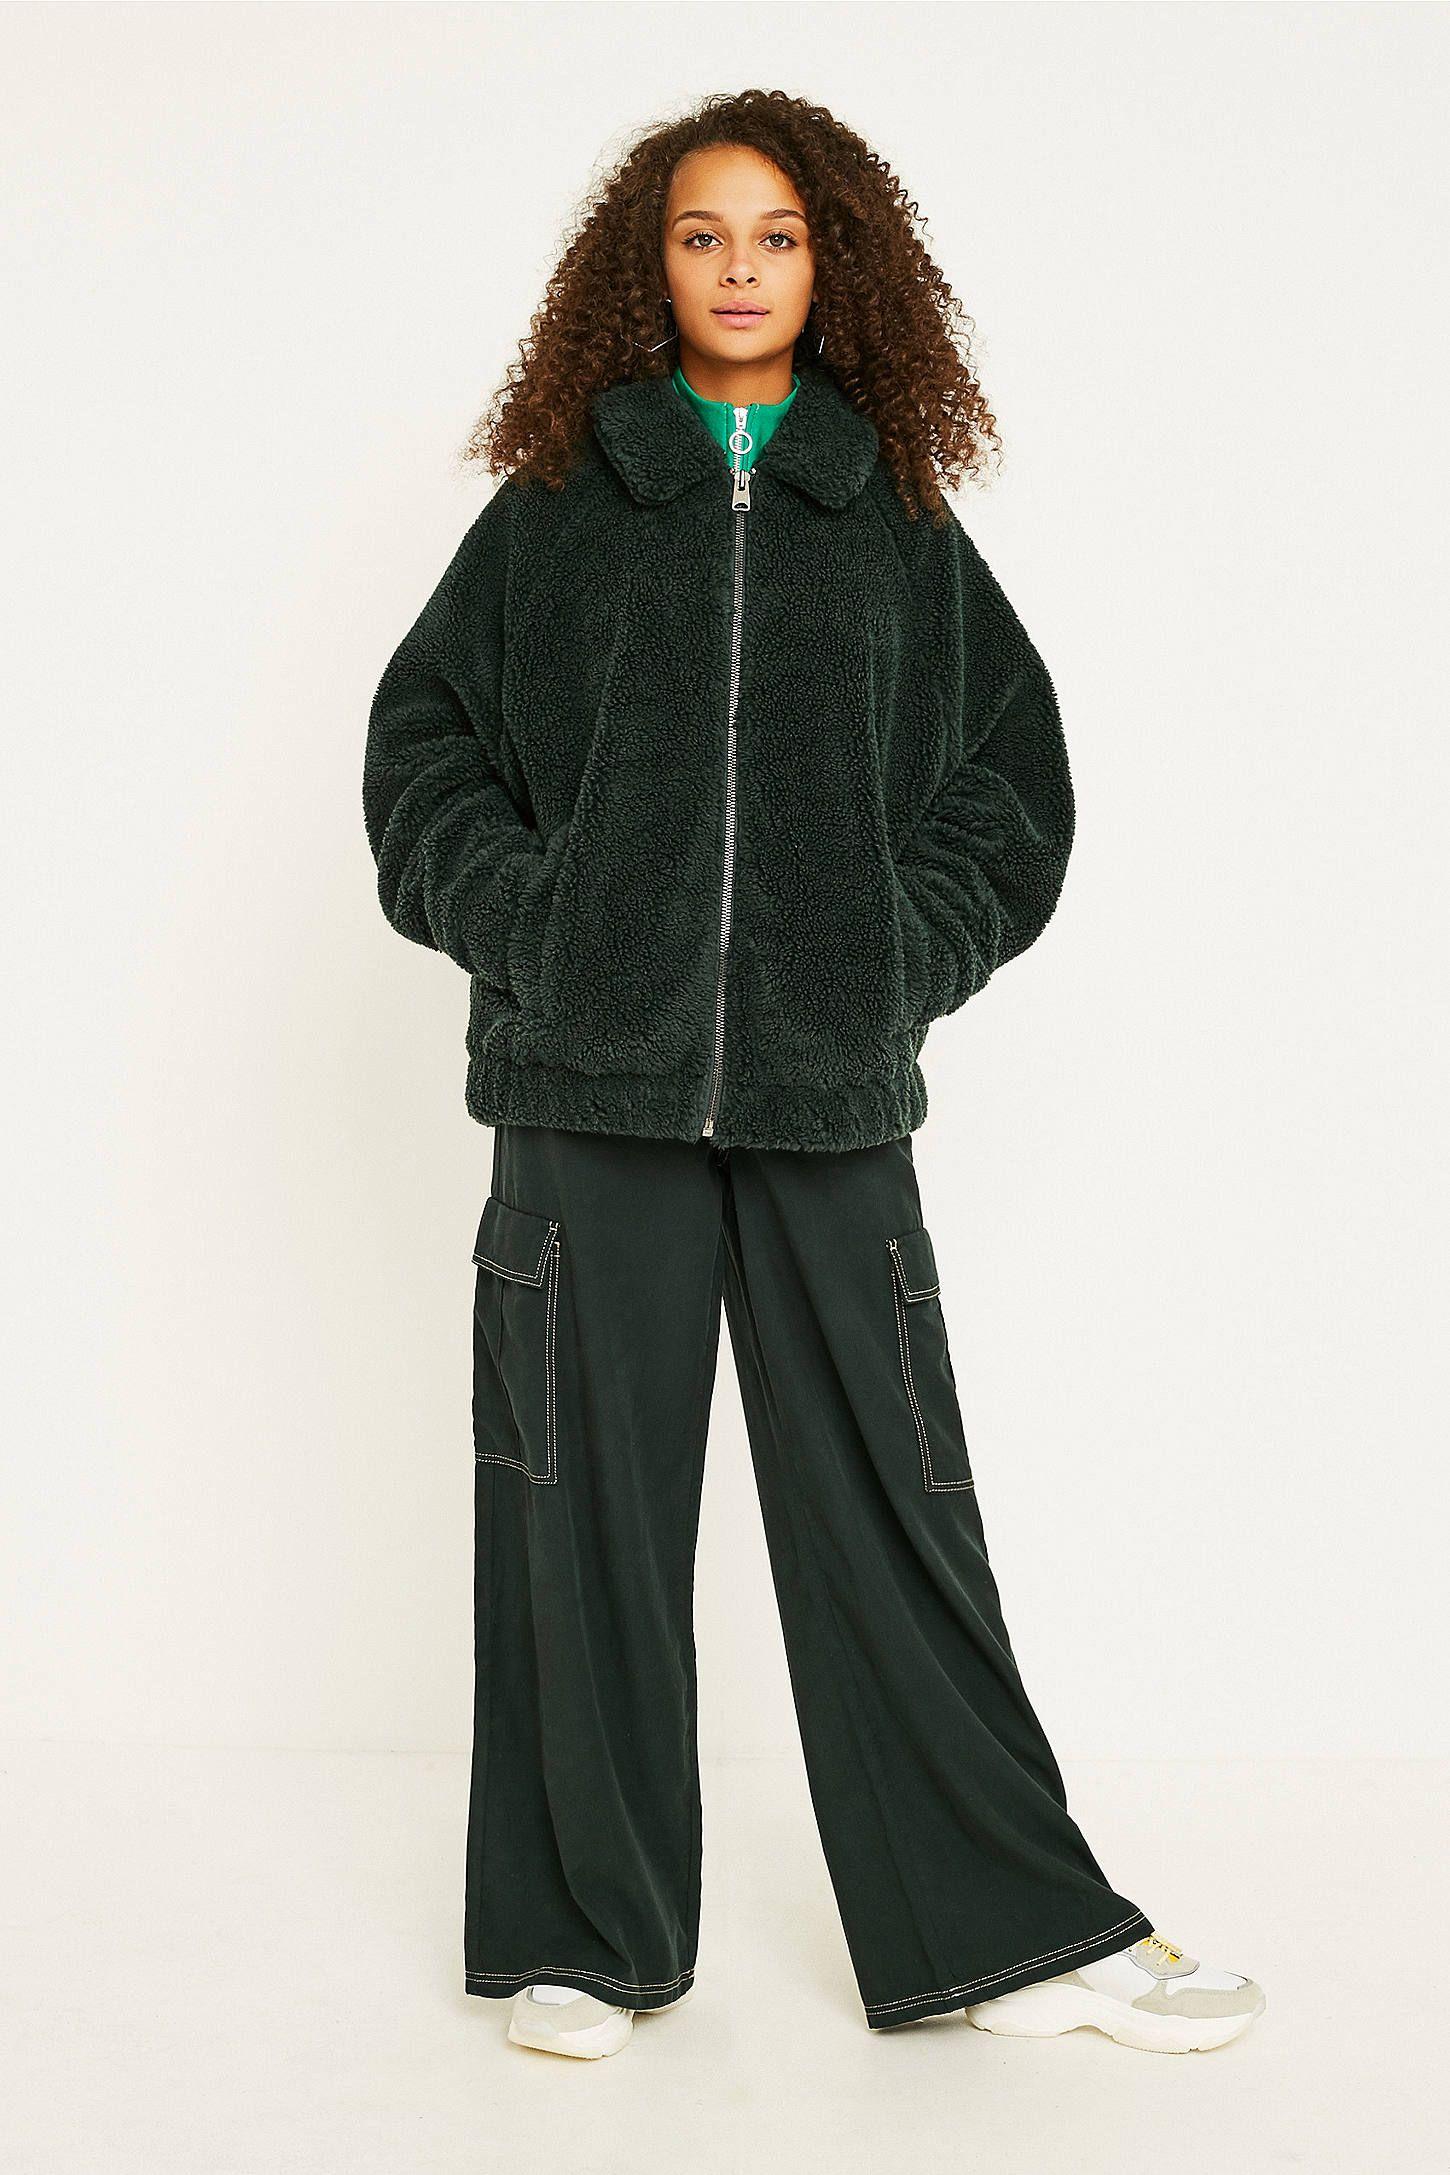 3ea7eff34 UO Green Teddy Zip-Through Coat | Uni clothes | Teddy coat, Green ...